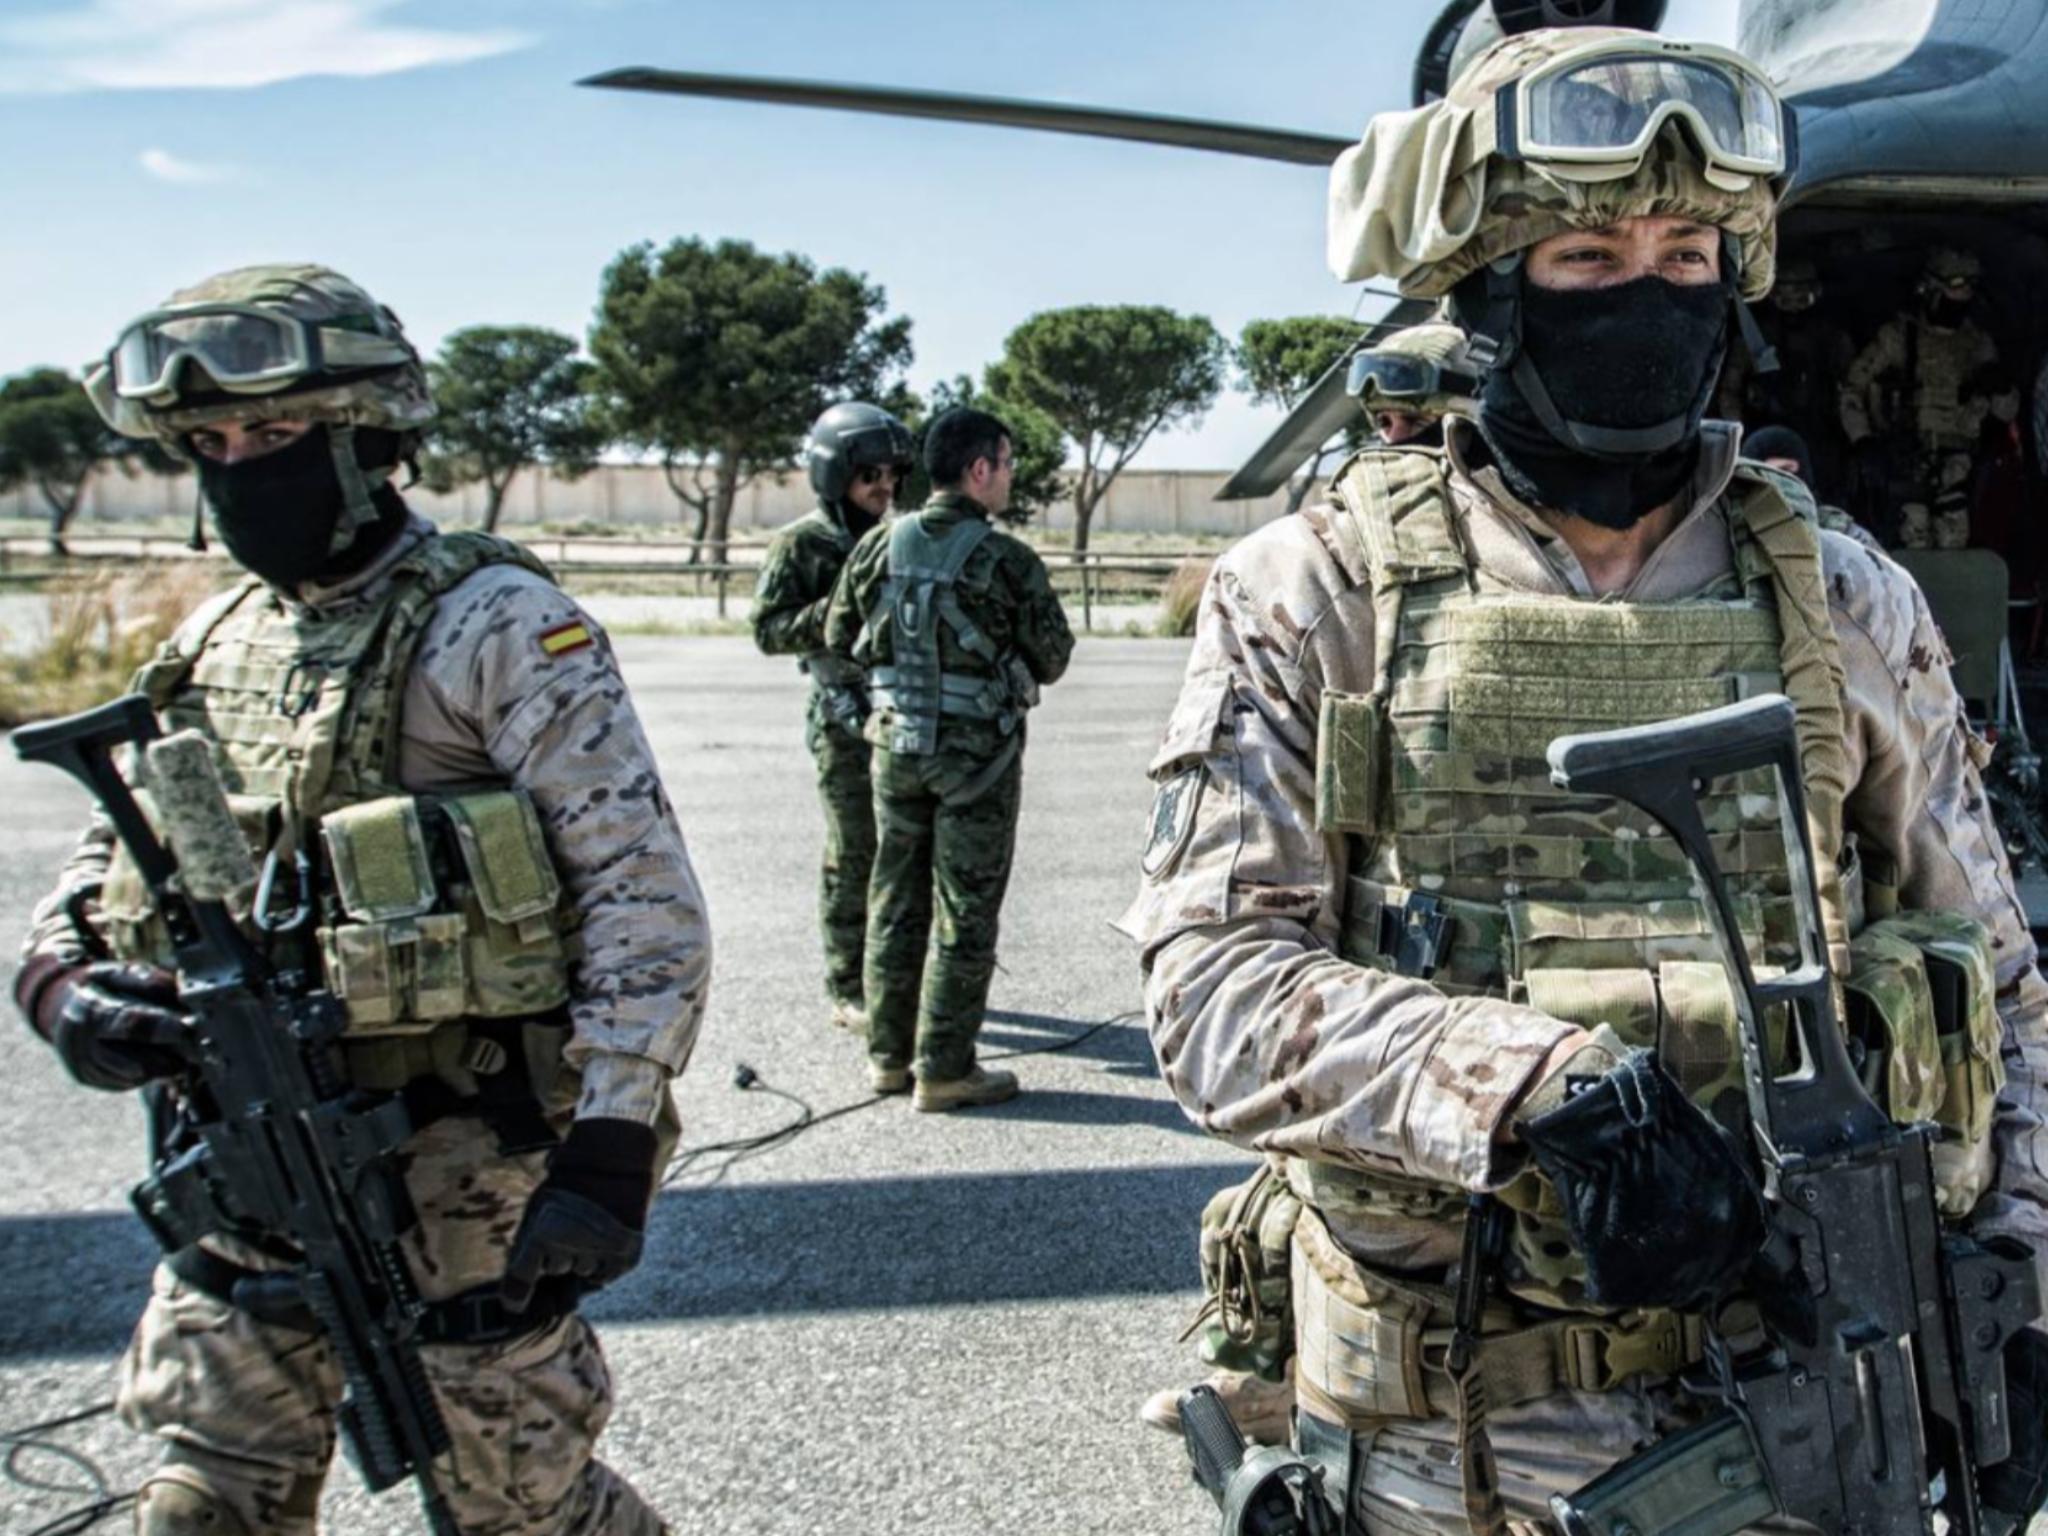 Spanish Special Forces Rapid Reaction Force Conducting A Hostage Exercise In Alecante Spain March 9 2015 Ejercito España Fuerzas Armadas De España Ejercito